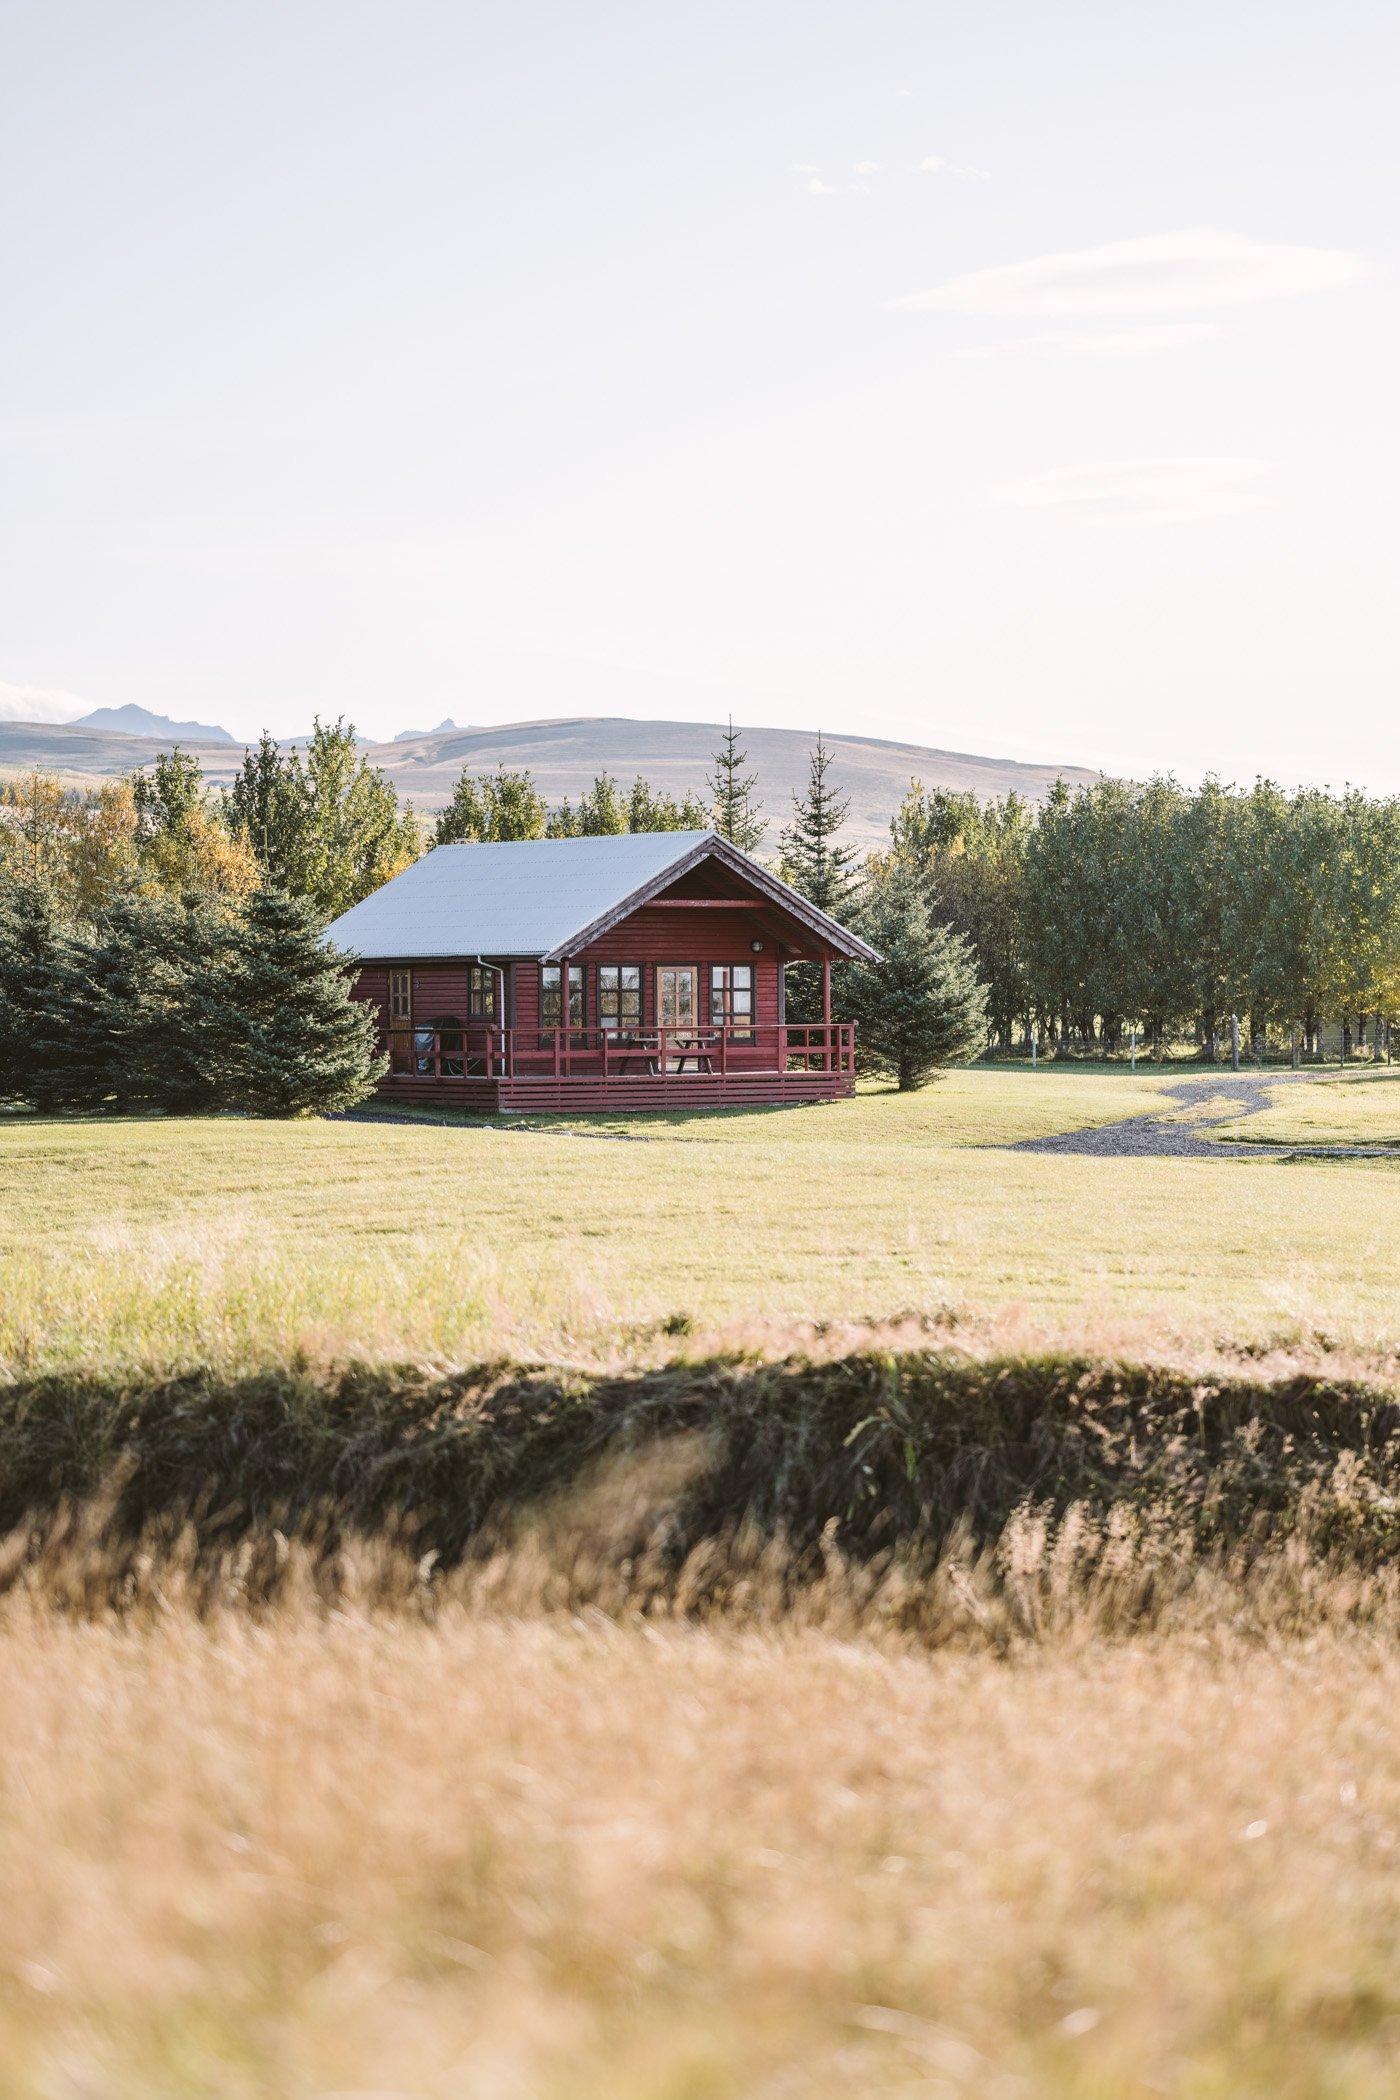 Hotel Fljotshlíd cabin